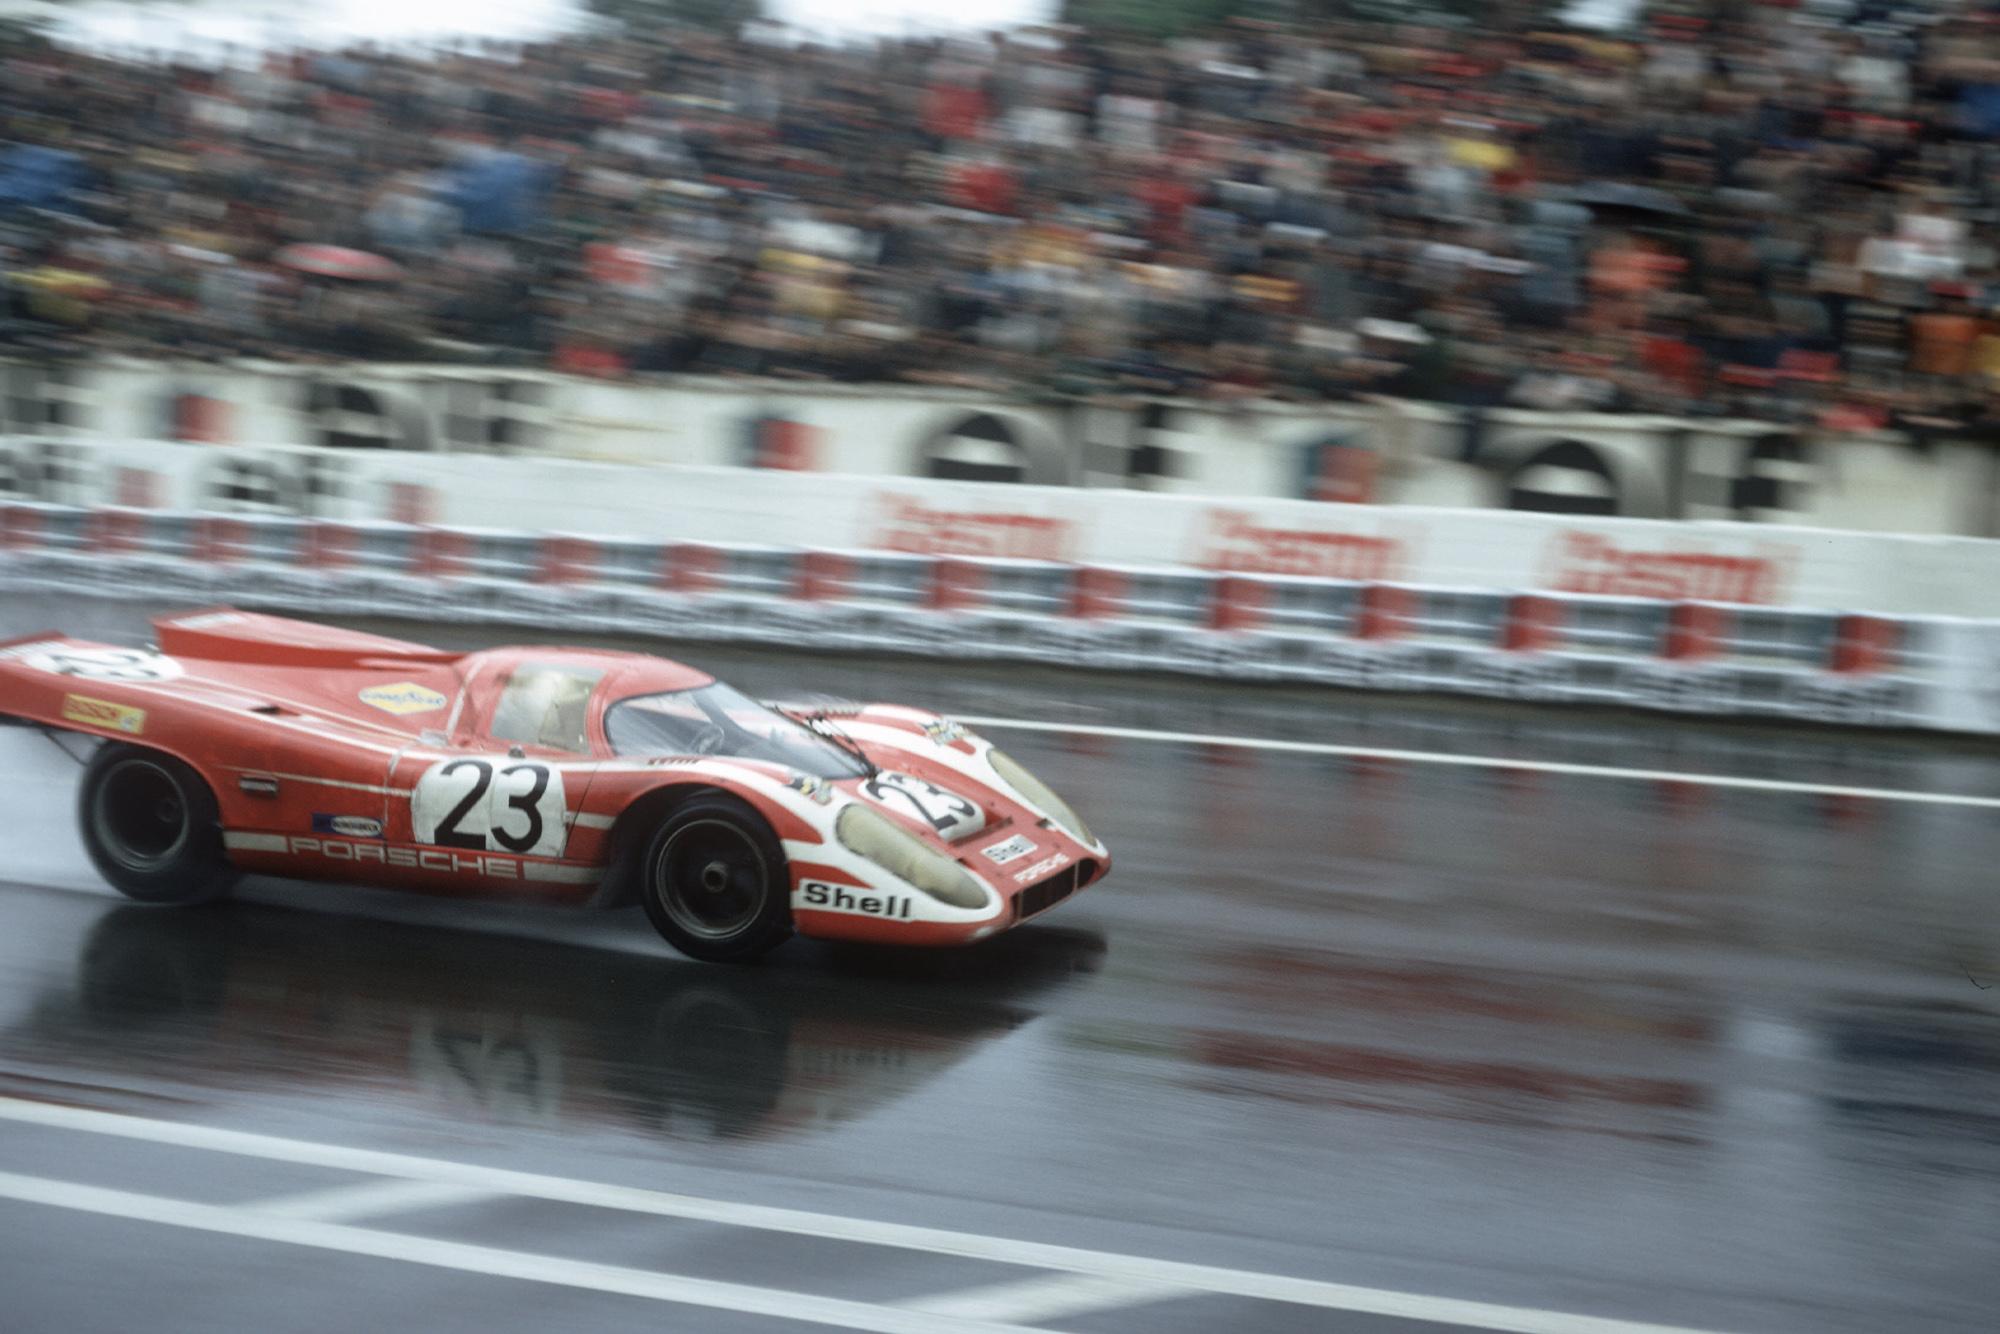 Attwood Herrmann Porsche 917 in the 1970 Le Mans 24 Hours